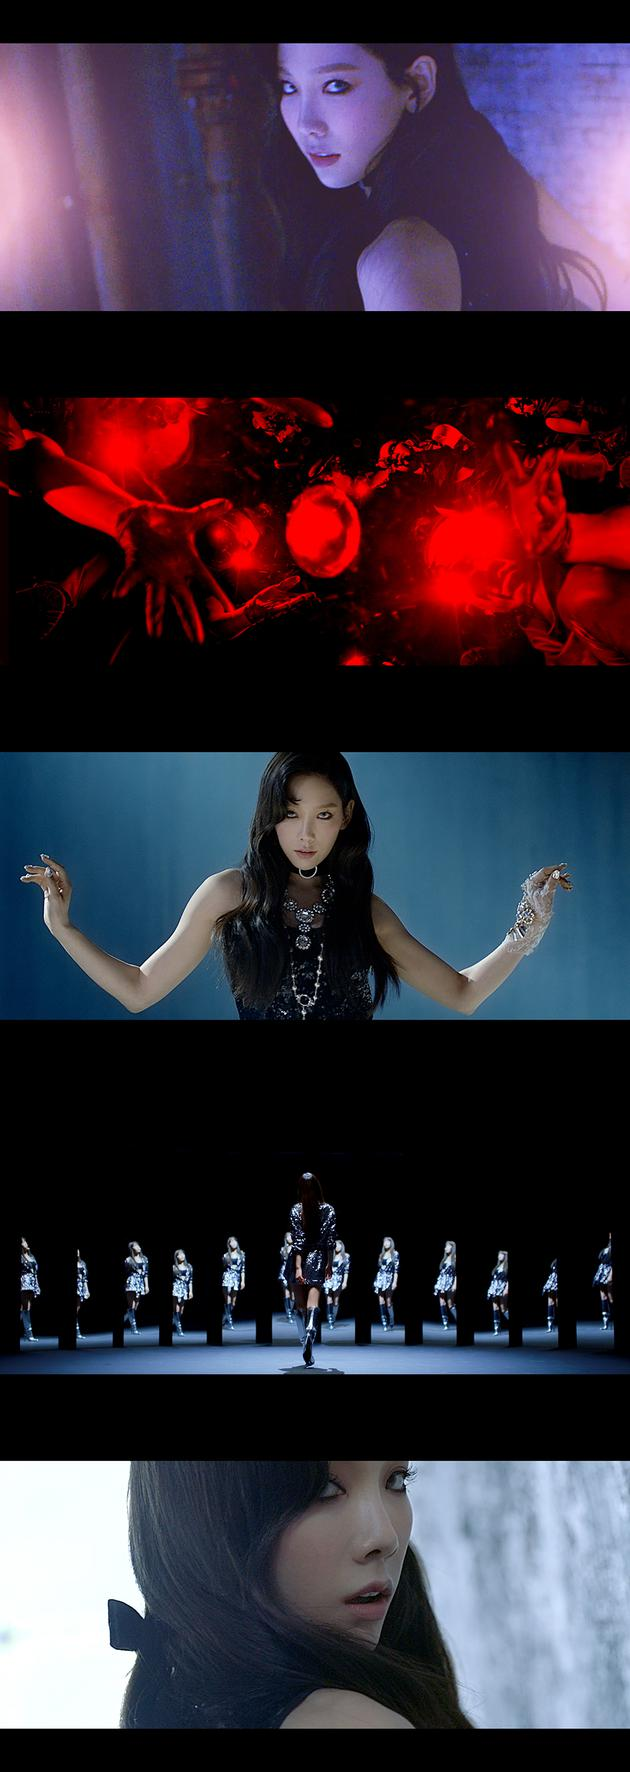 太妍首张正规专辑《I Got Love》